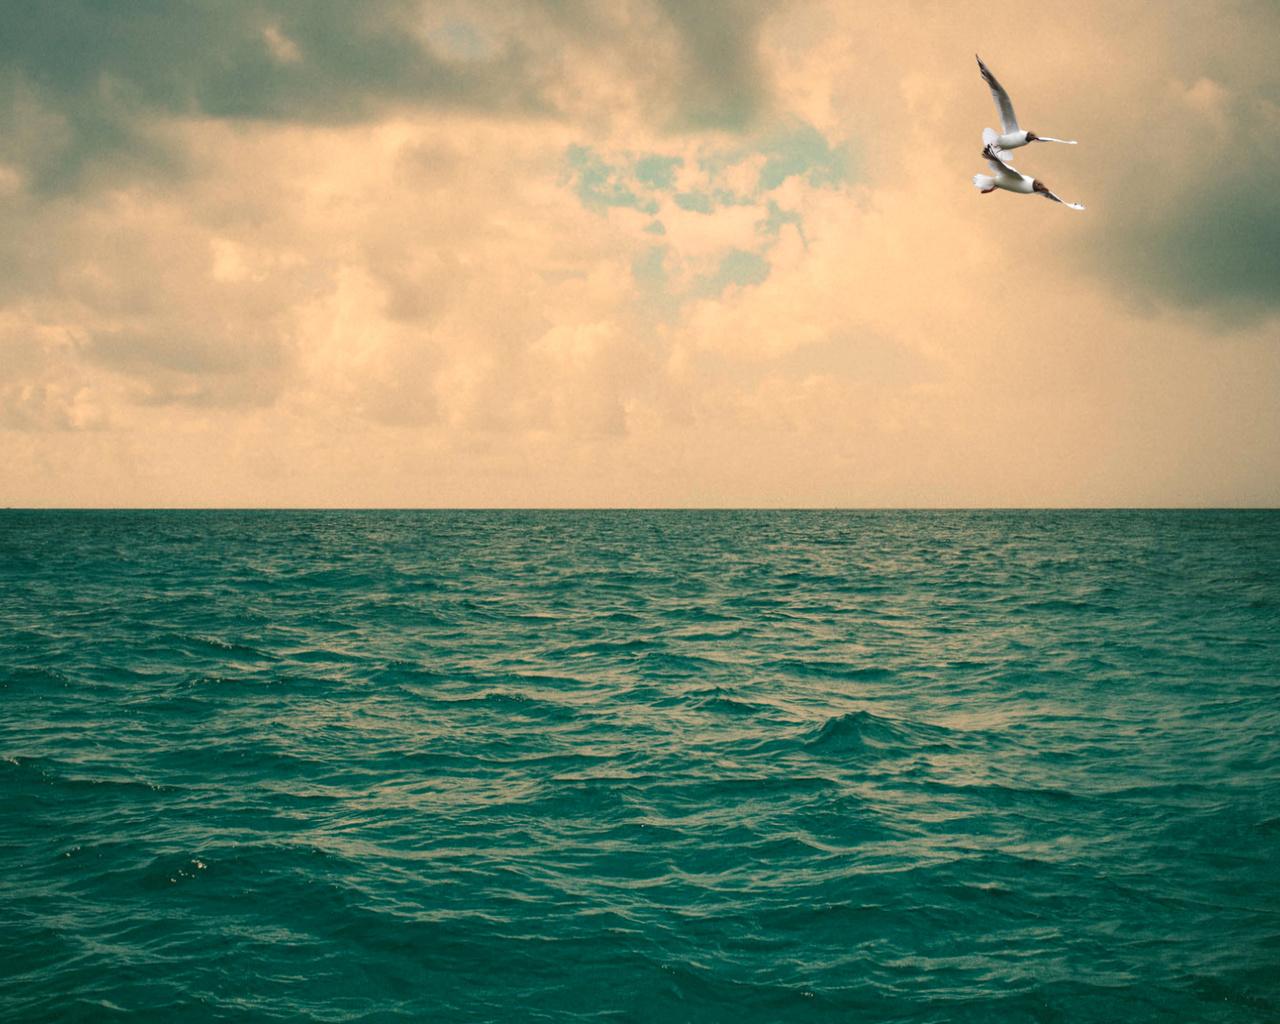 пейзаж, небо, океан